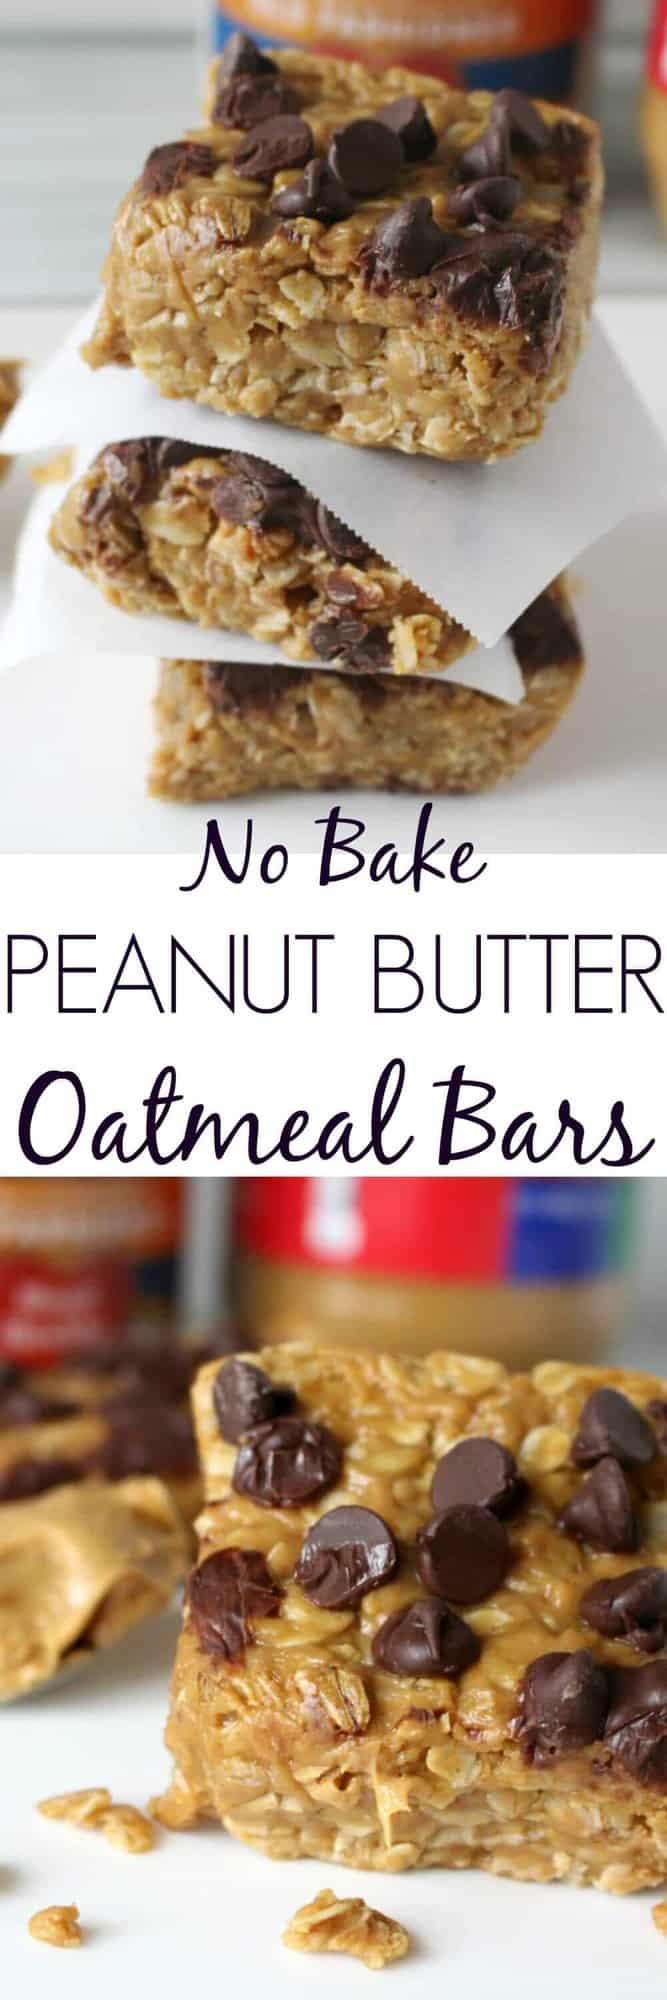 No Bake Peanut Butter Oatmeal Bars - Princess Pinky Girl